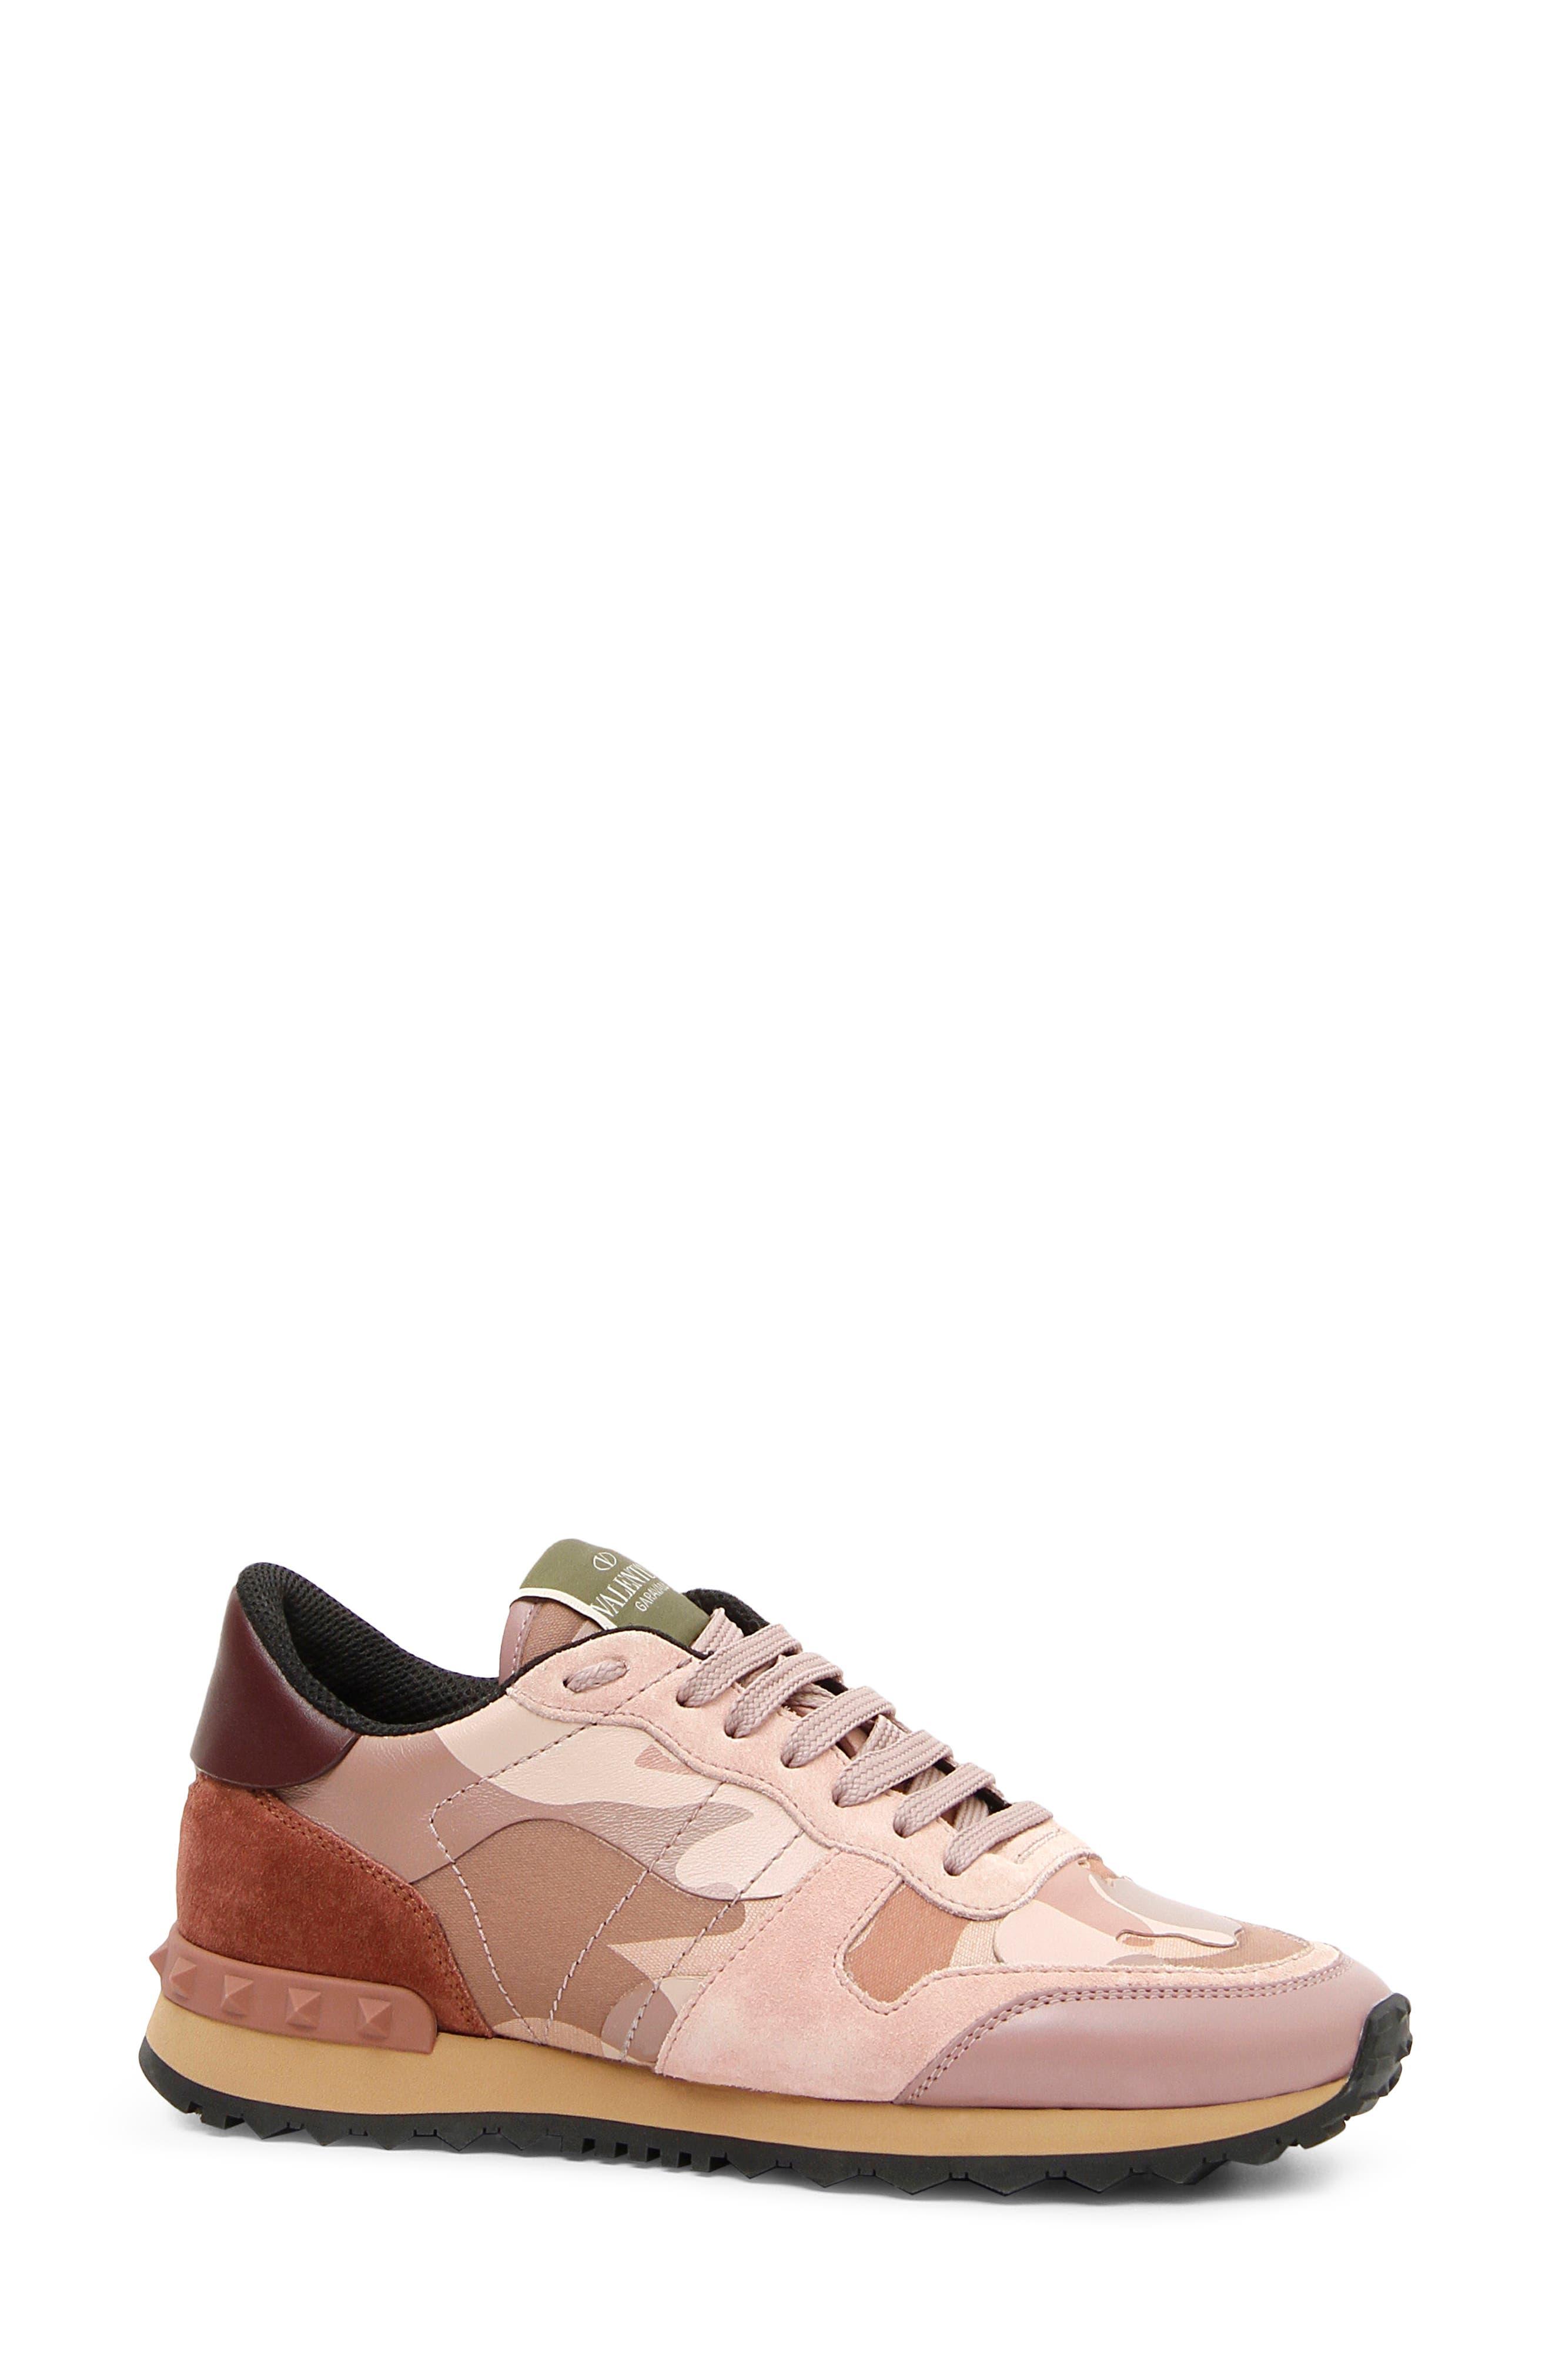 Rockstud Sneaker,                         Main,                         color, Poudre/ Rose